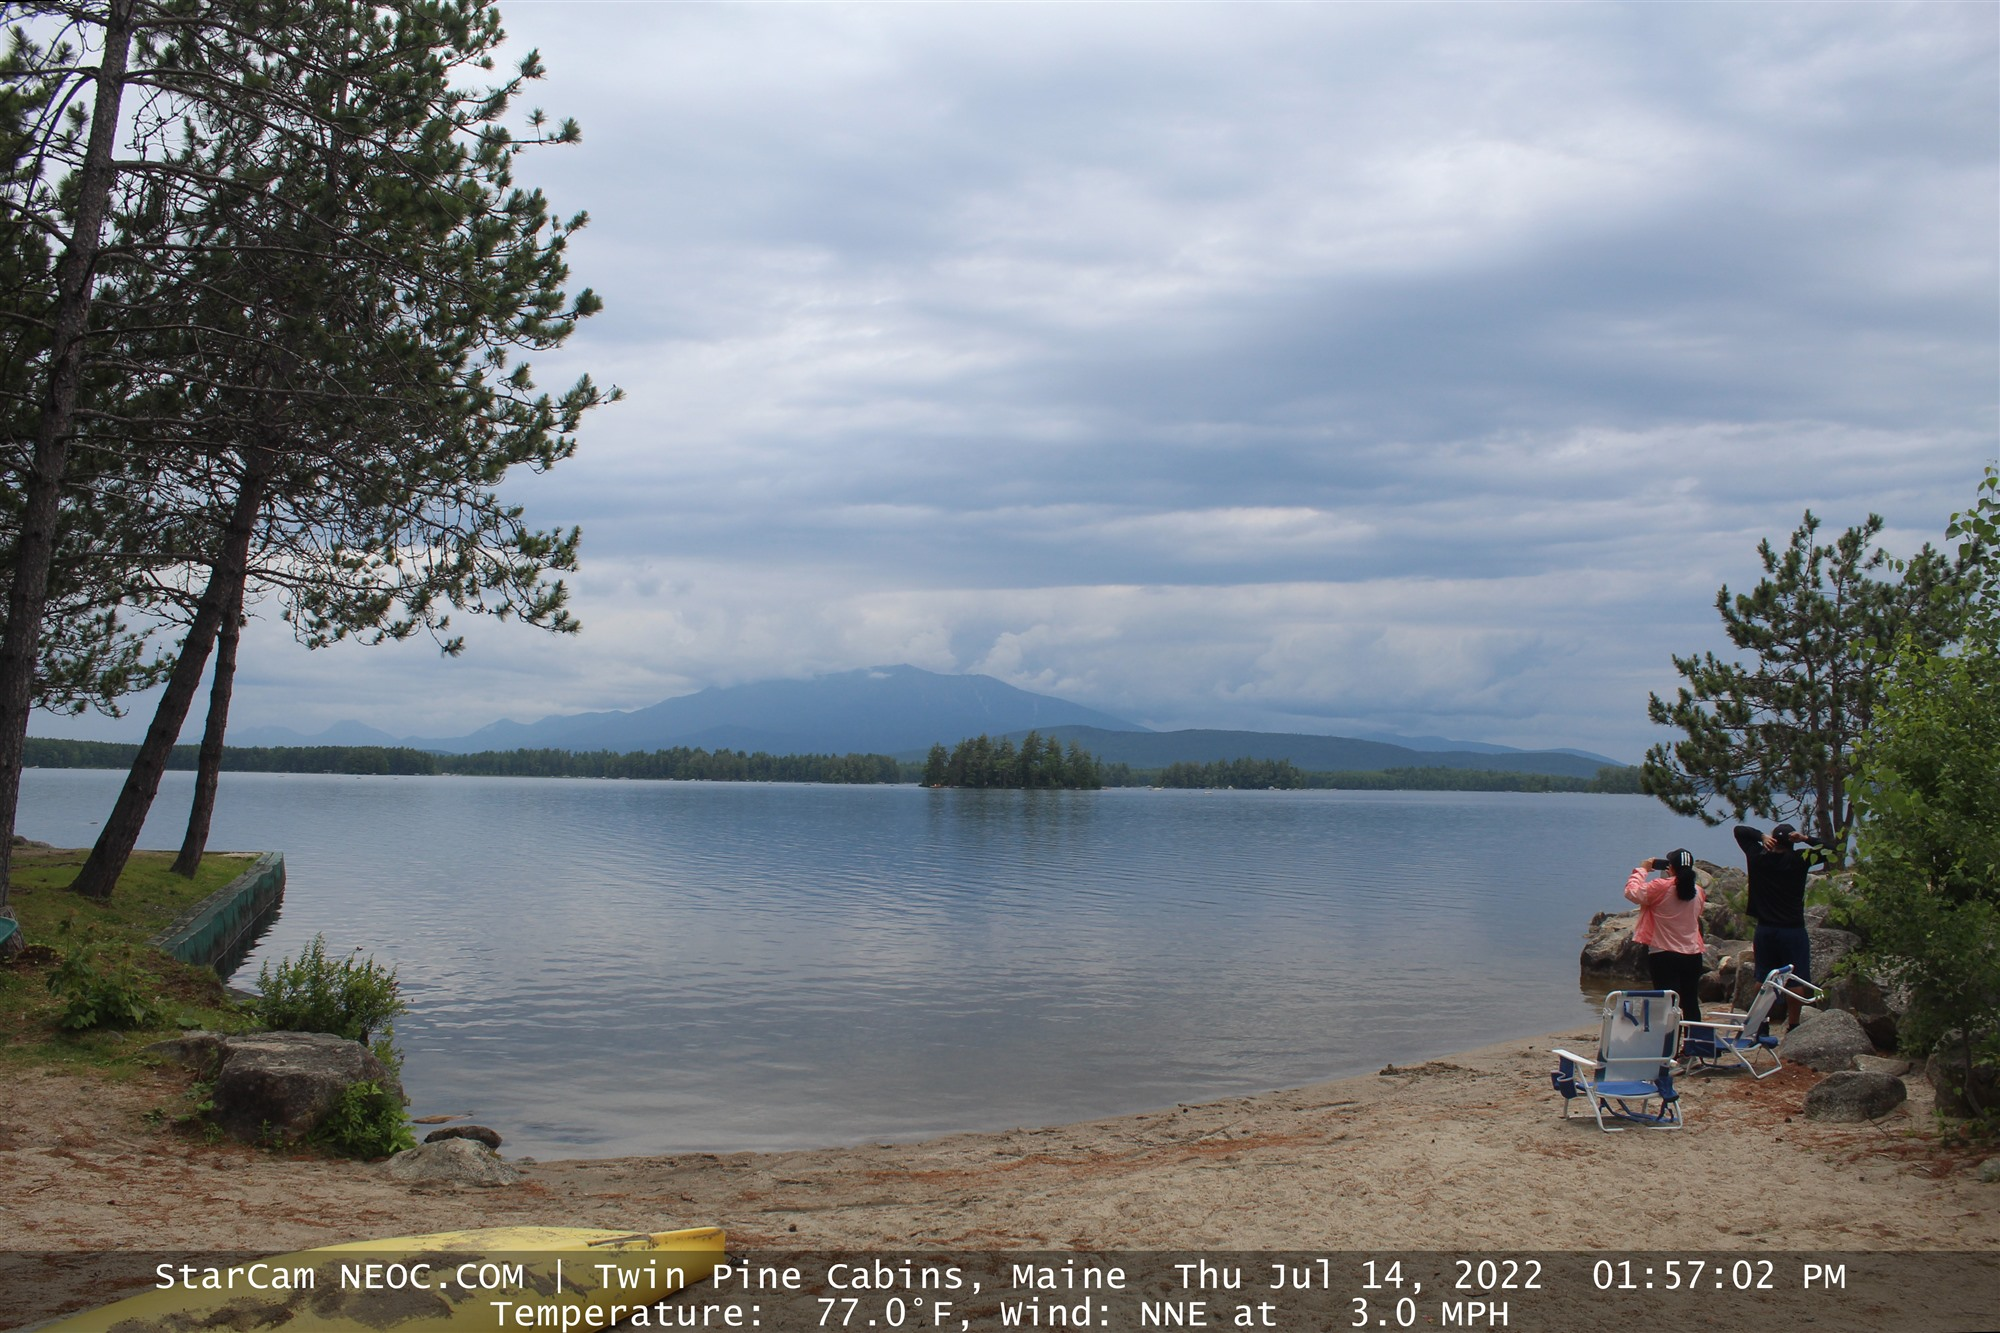 Web Camera is located in Canada.